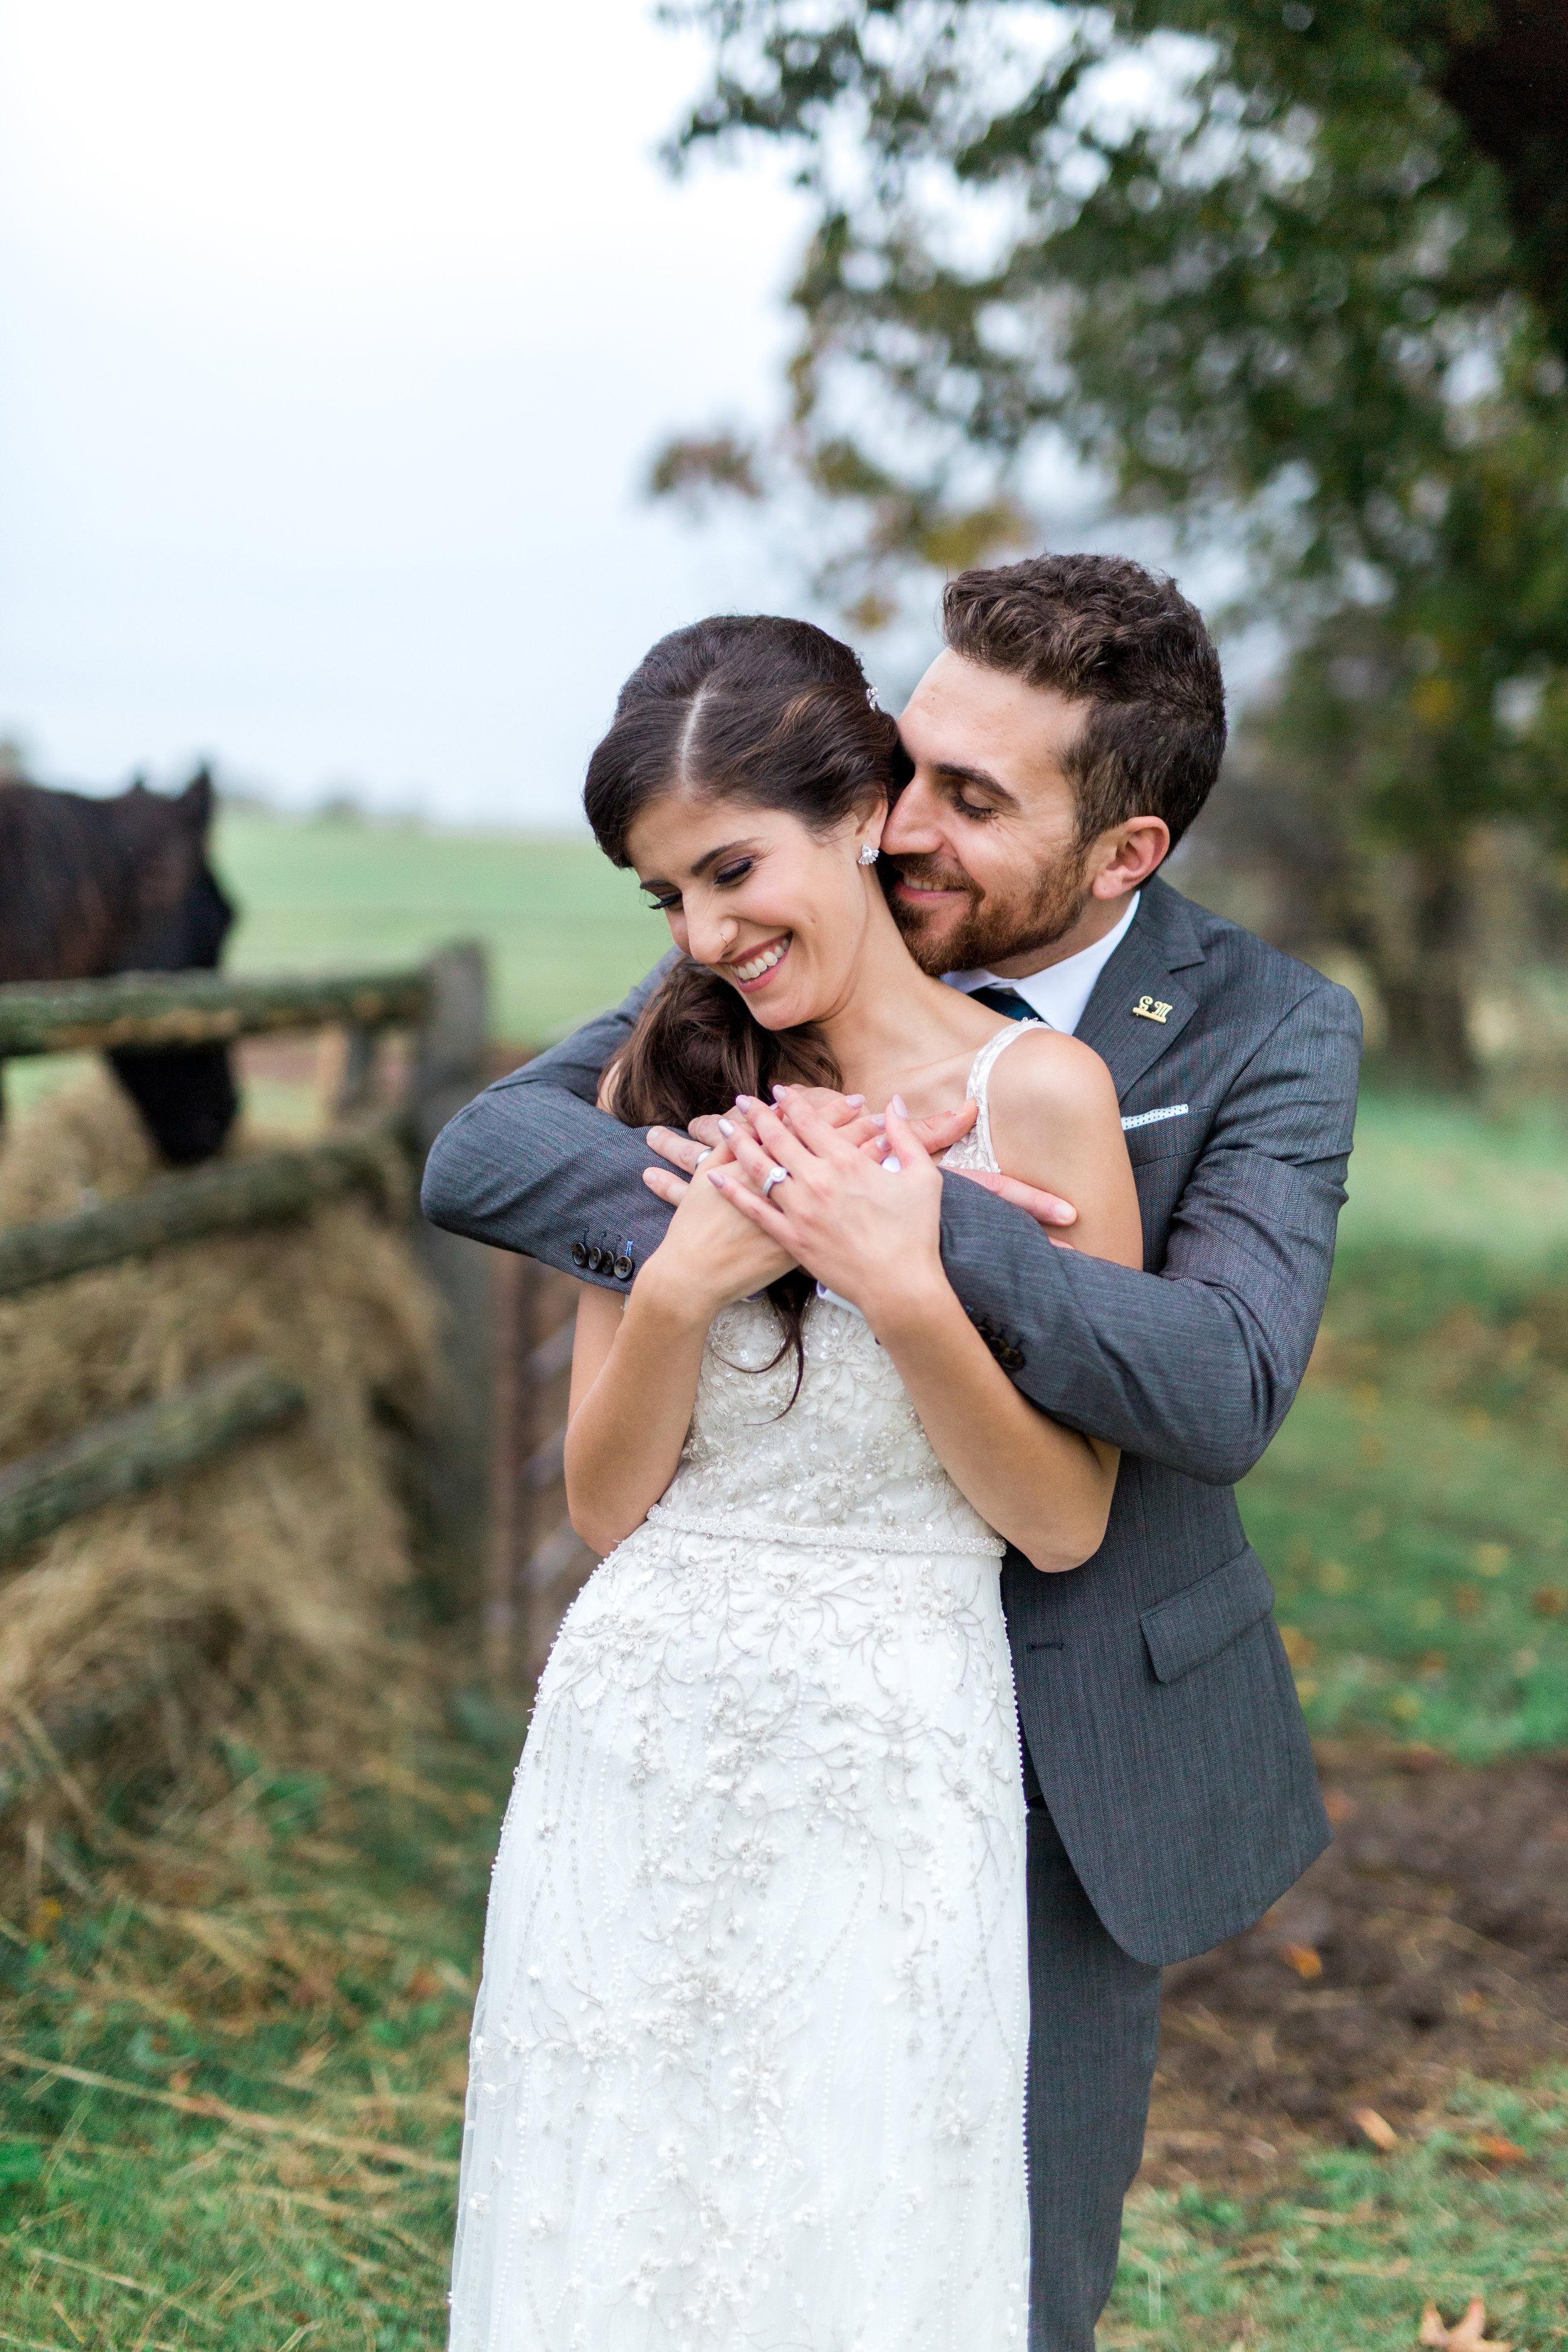 Amir-Golbazi-Danielle-Giroux-Photography_Toronto-Wedding_Cedarwood_Rachel-Paul_506.jpg